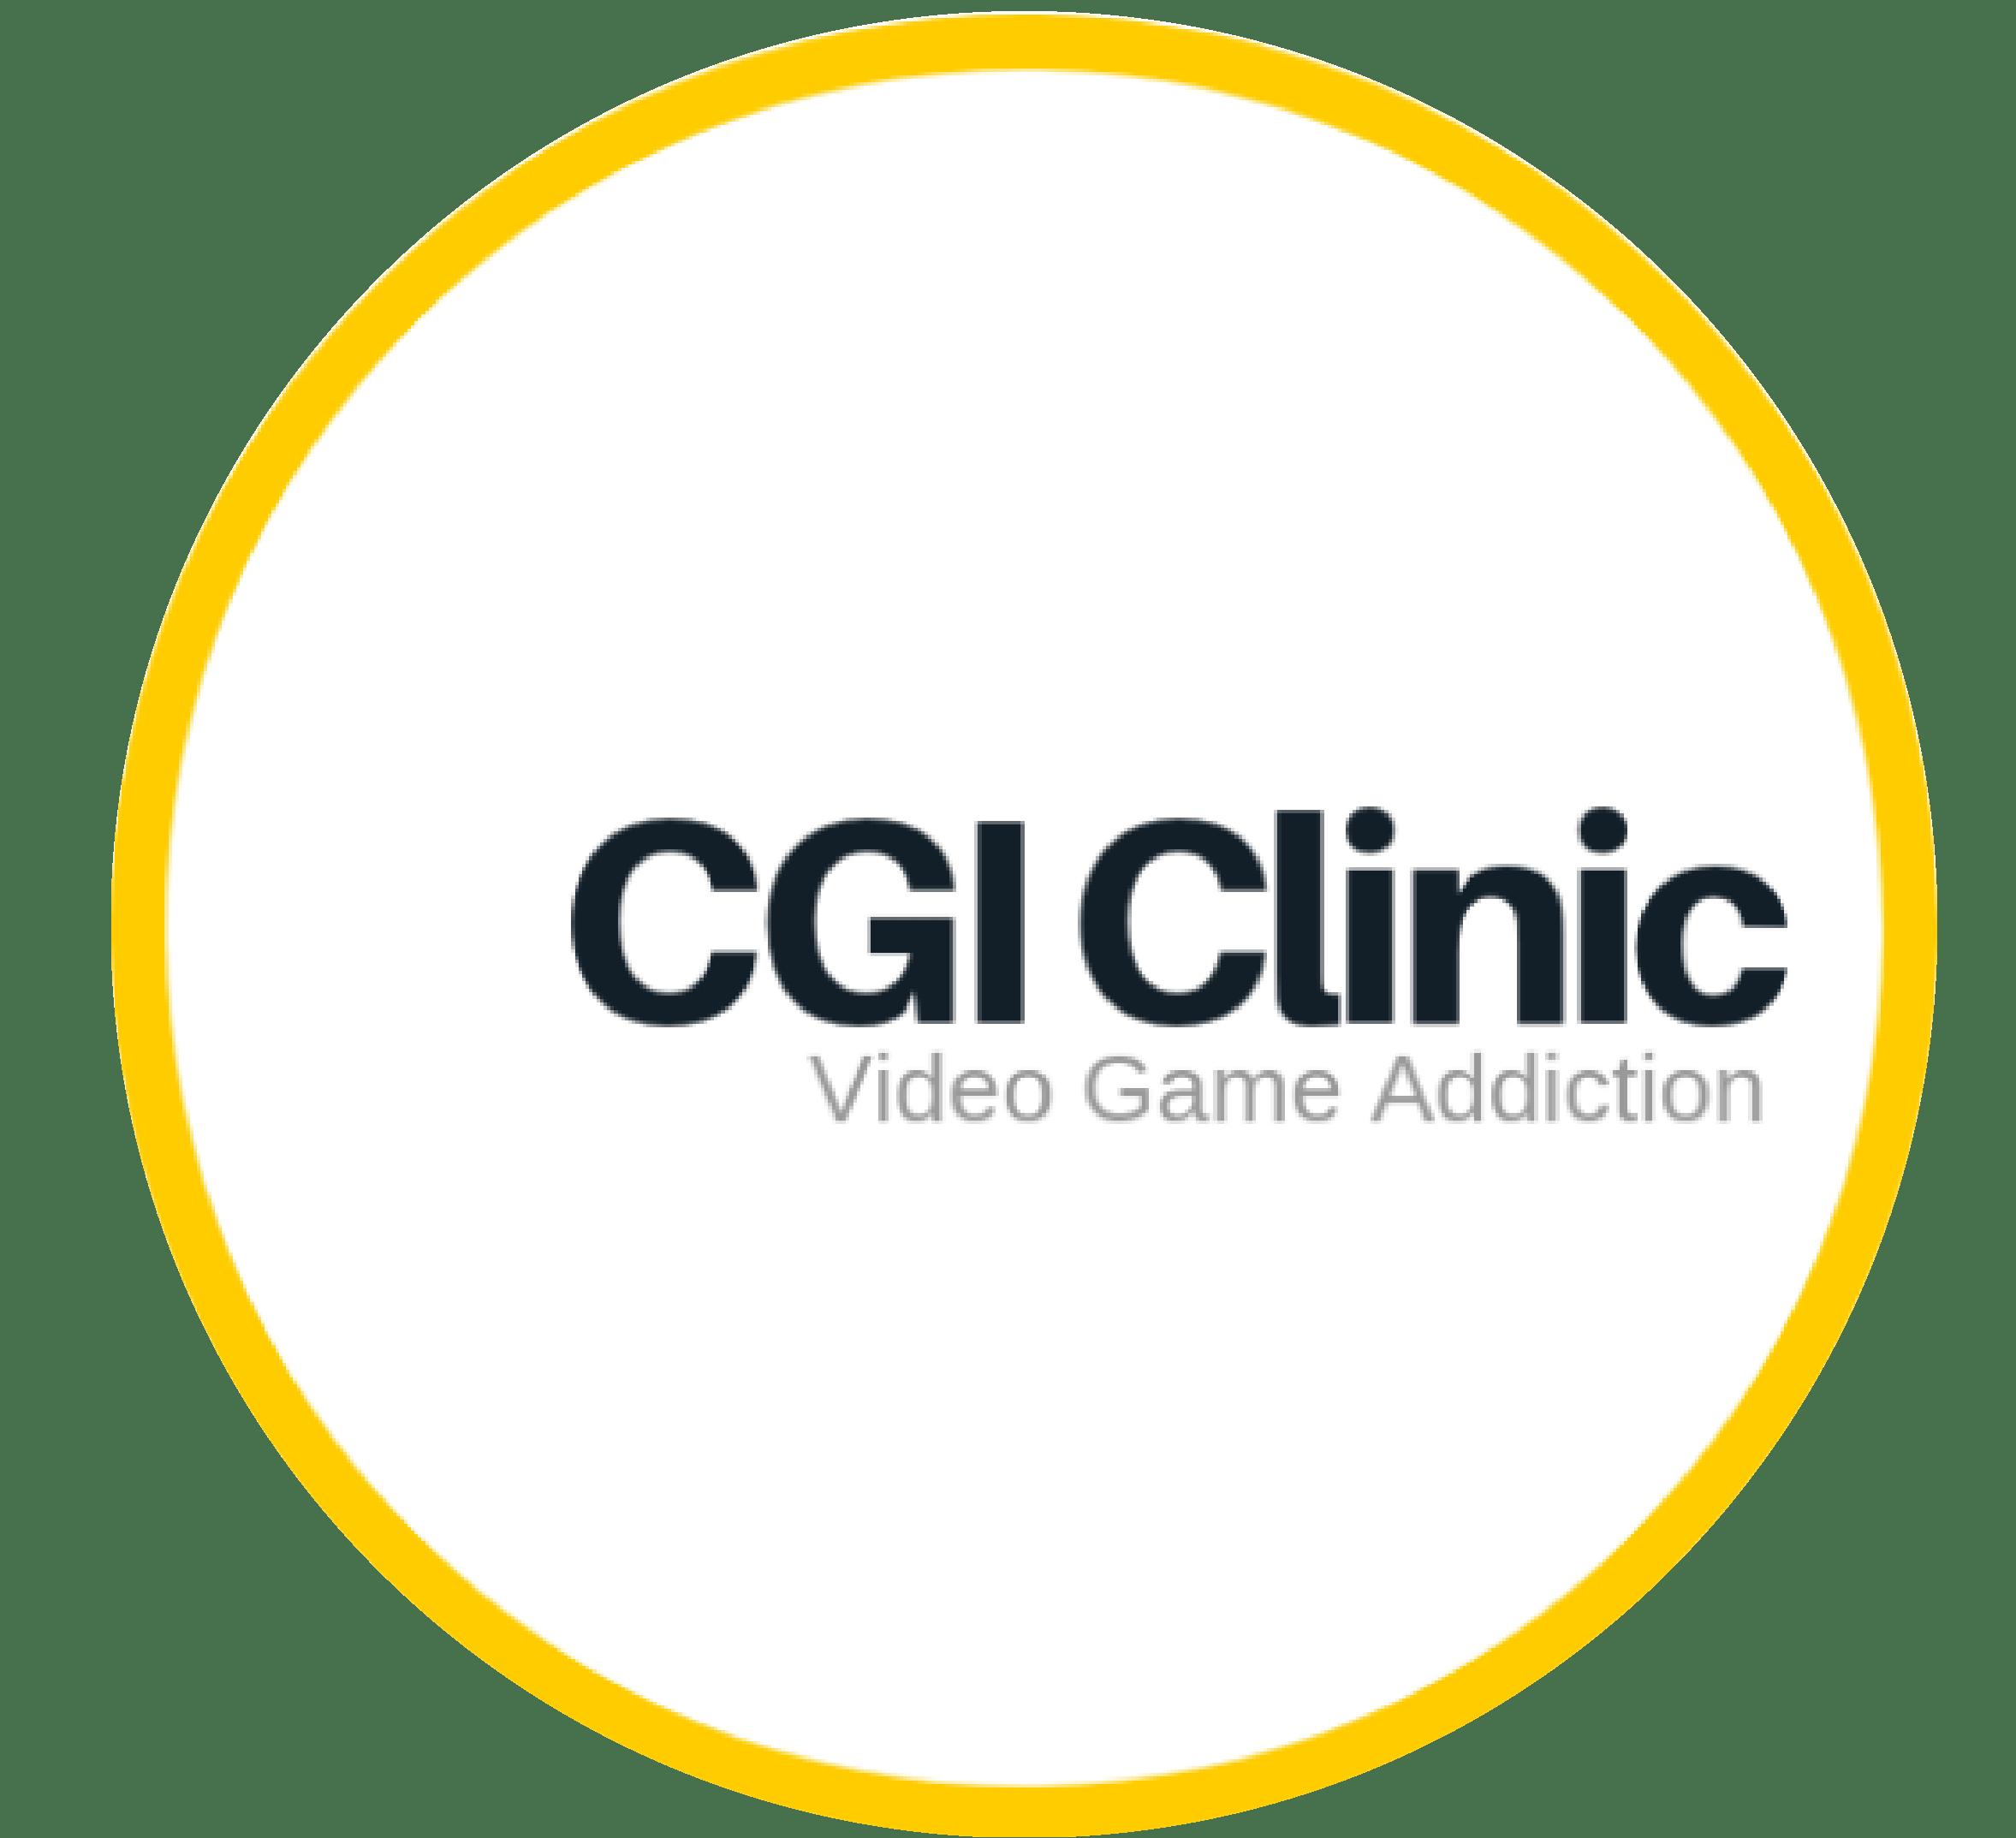 CGI Clinic - Teleheath Consultations For Internet Gaming Disorder